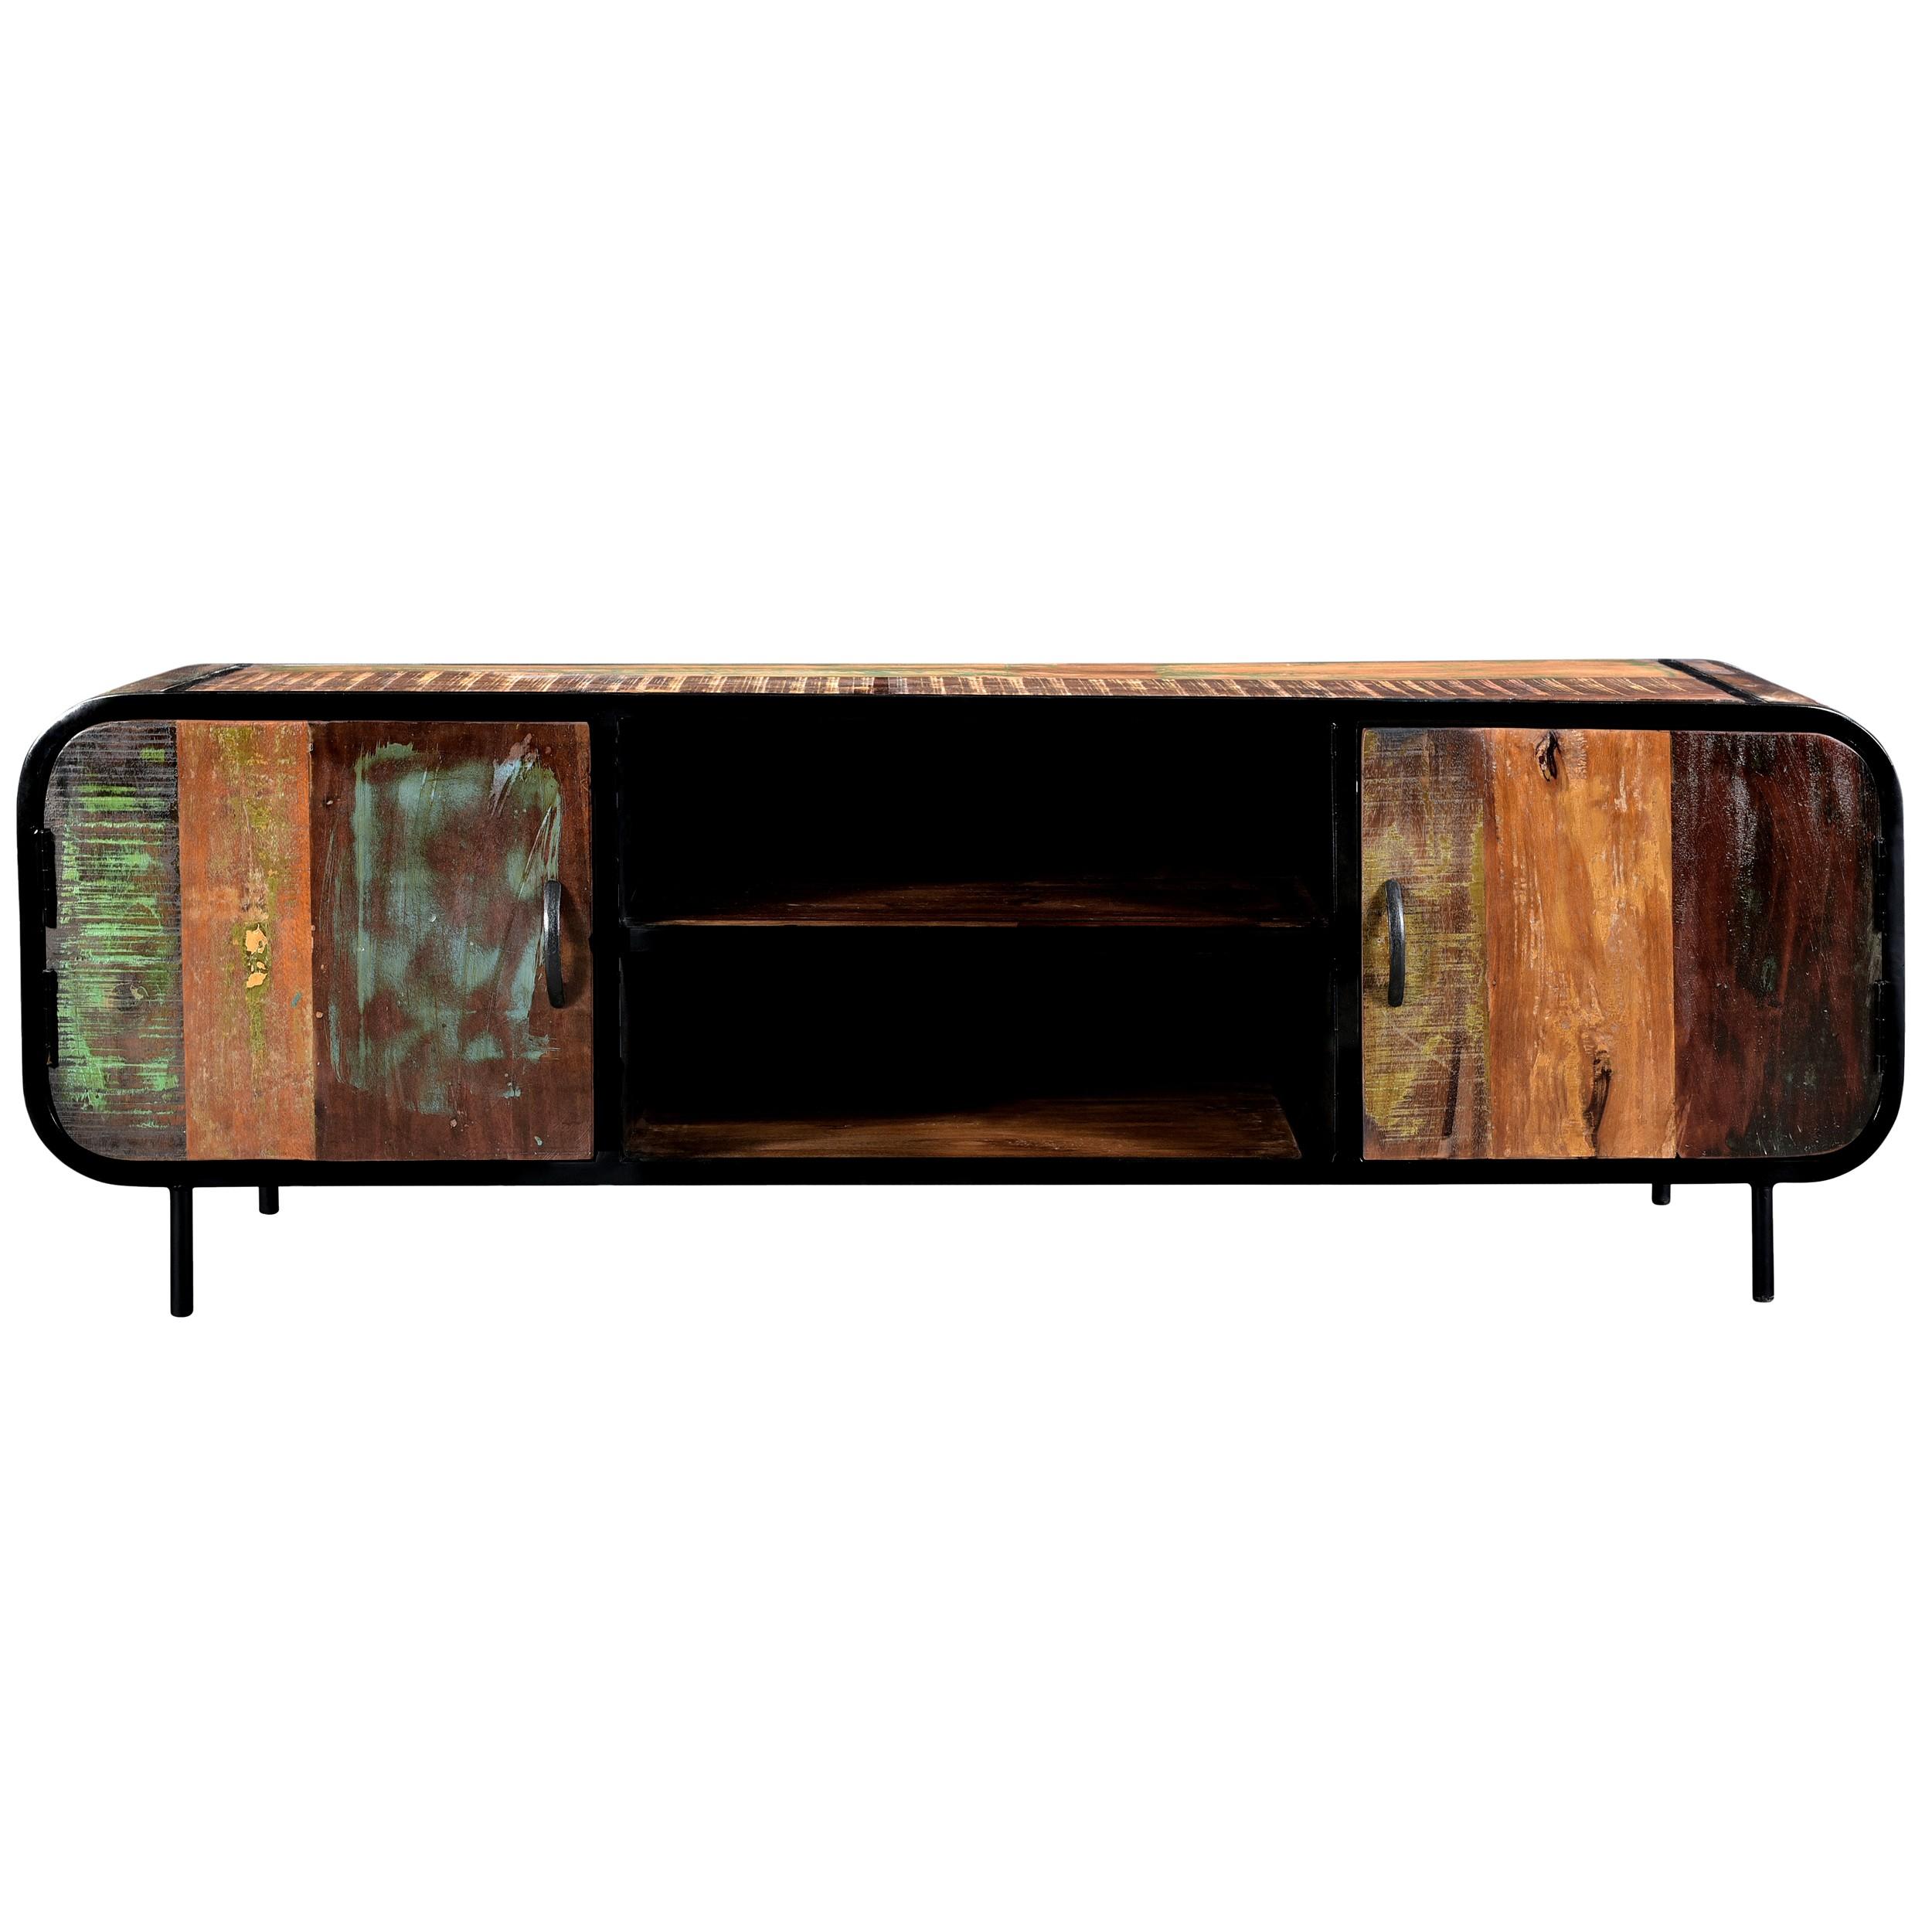 meuble tv manille en bois recycl testez nos meubles tv manille en bois recycl rdv d co. Black Bedroom Furniture Sets. Home Design Ideas